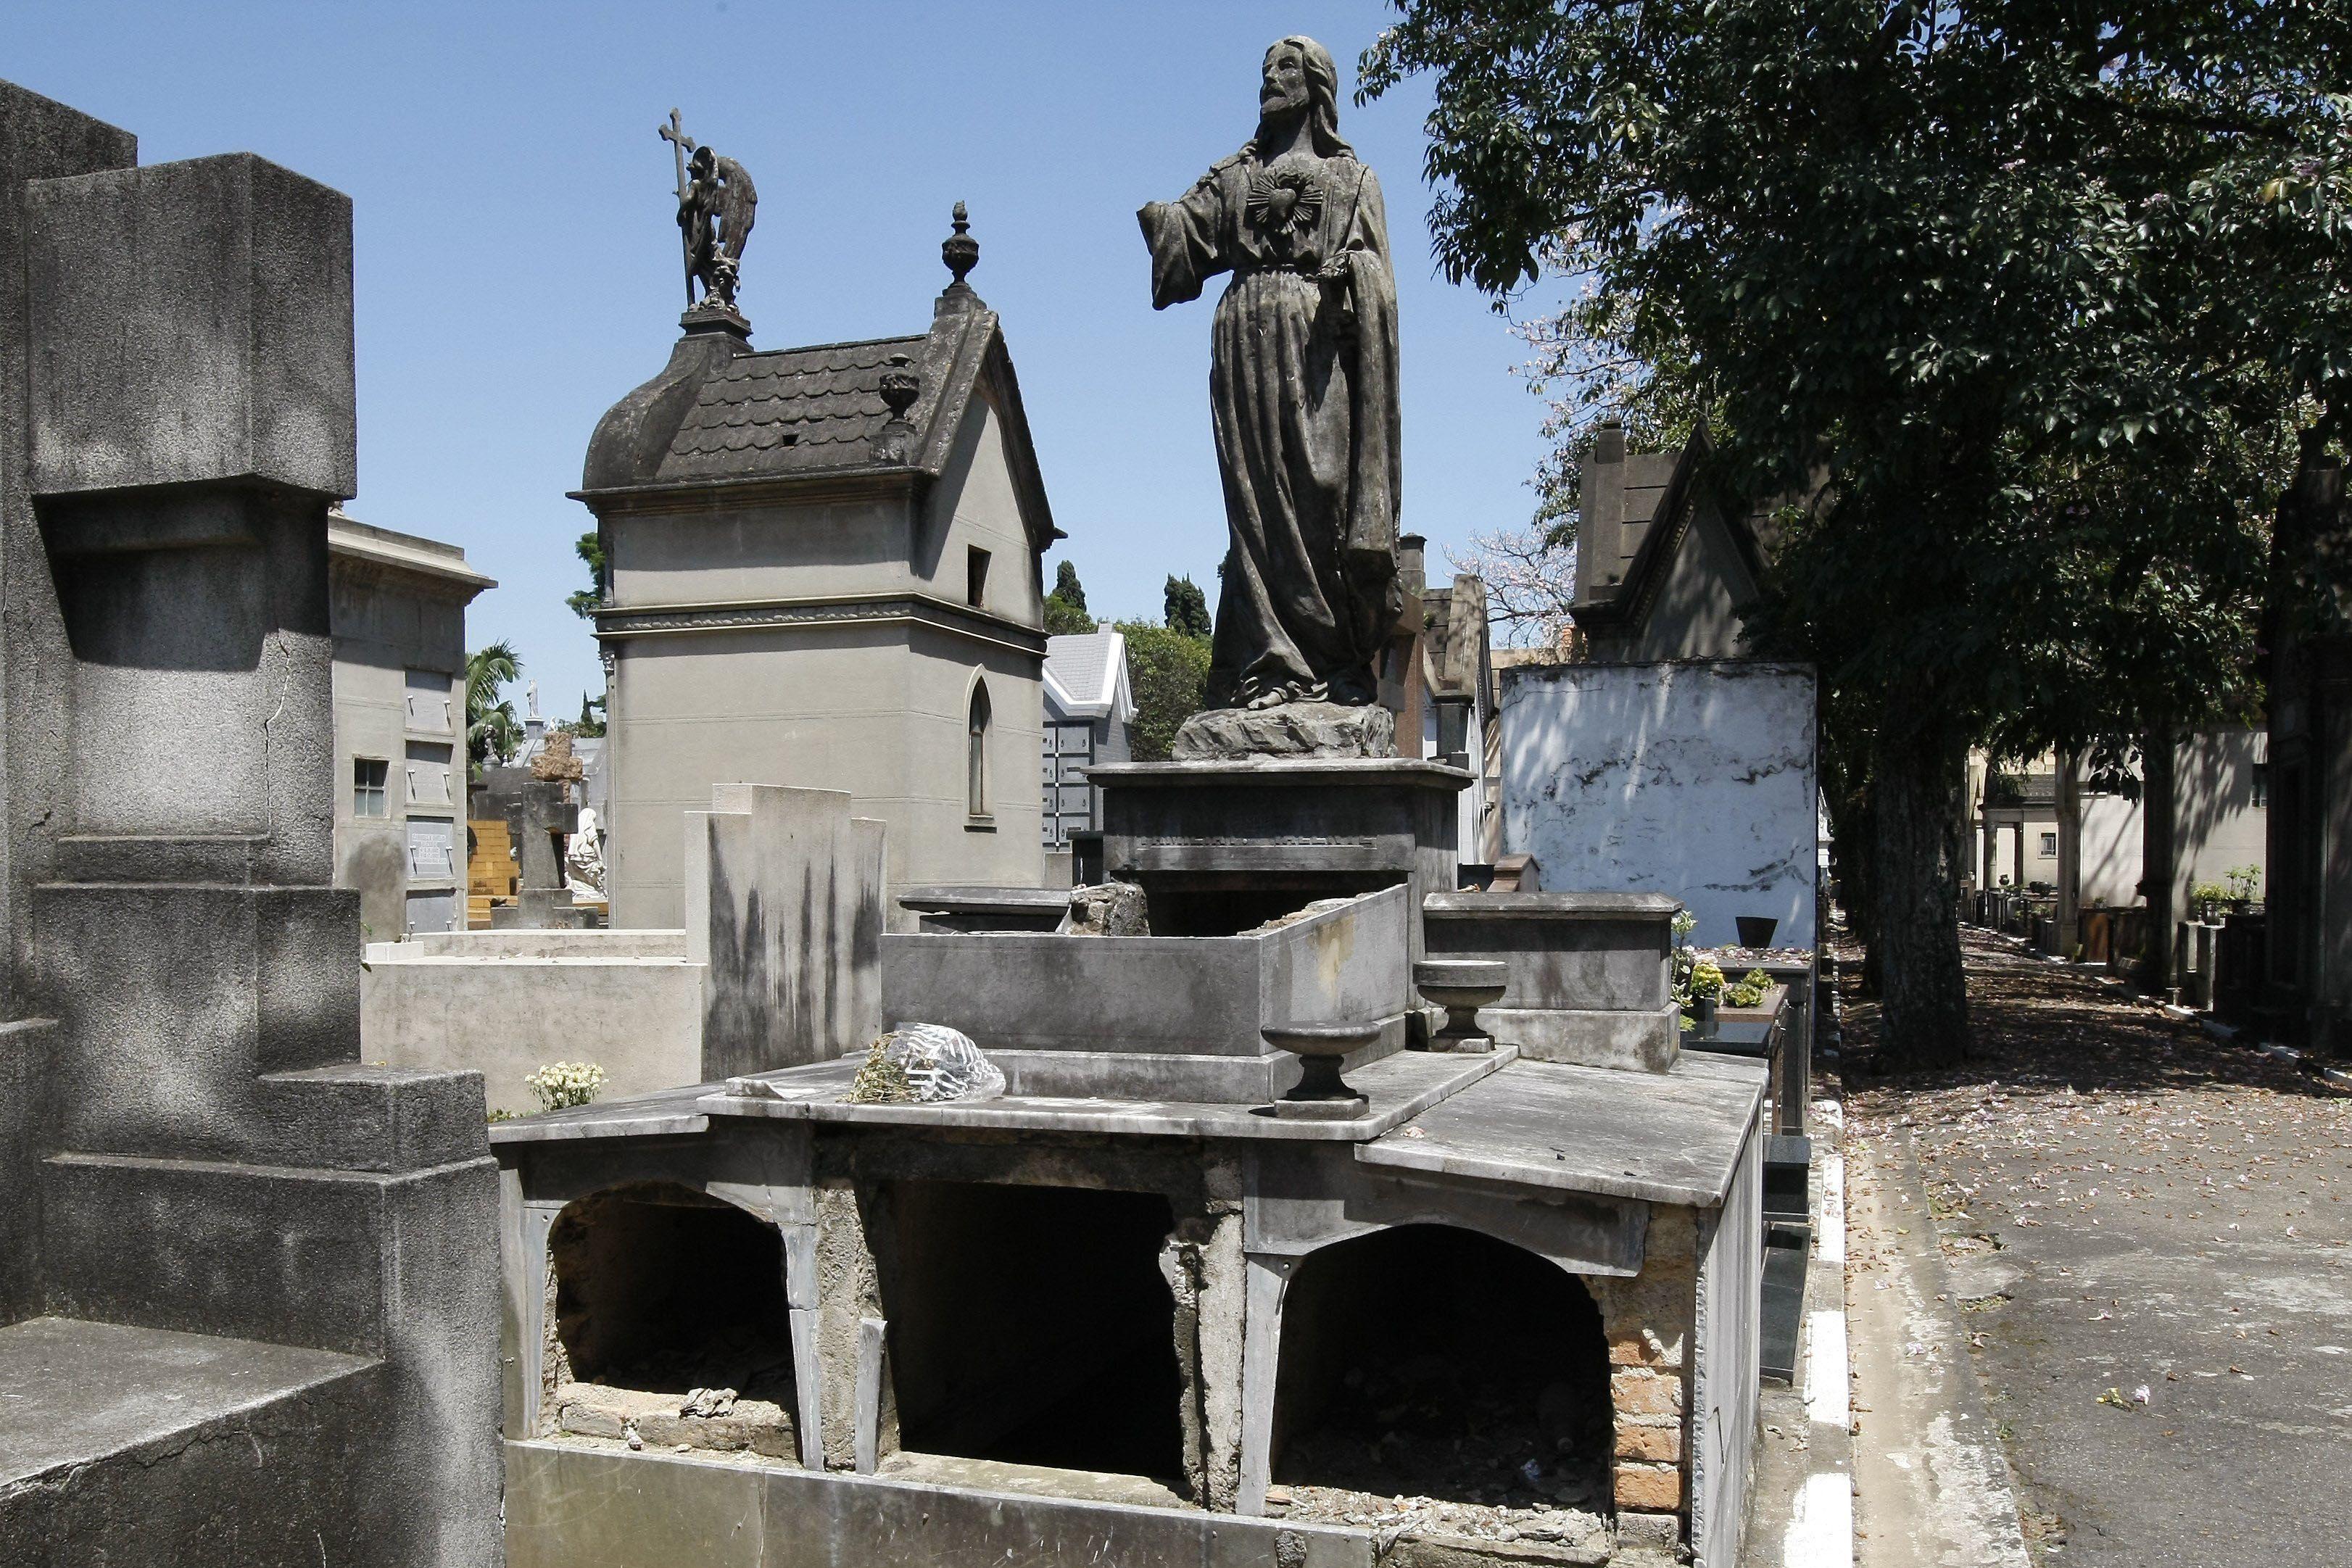 Cemitério do Araçá após onda de furtos / Luiz Carlos Murauskas/Folhapress